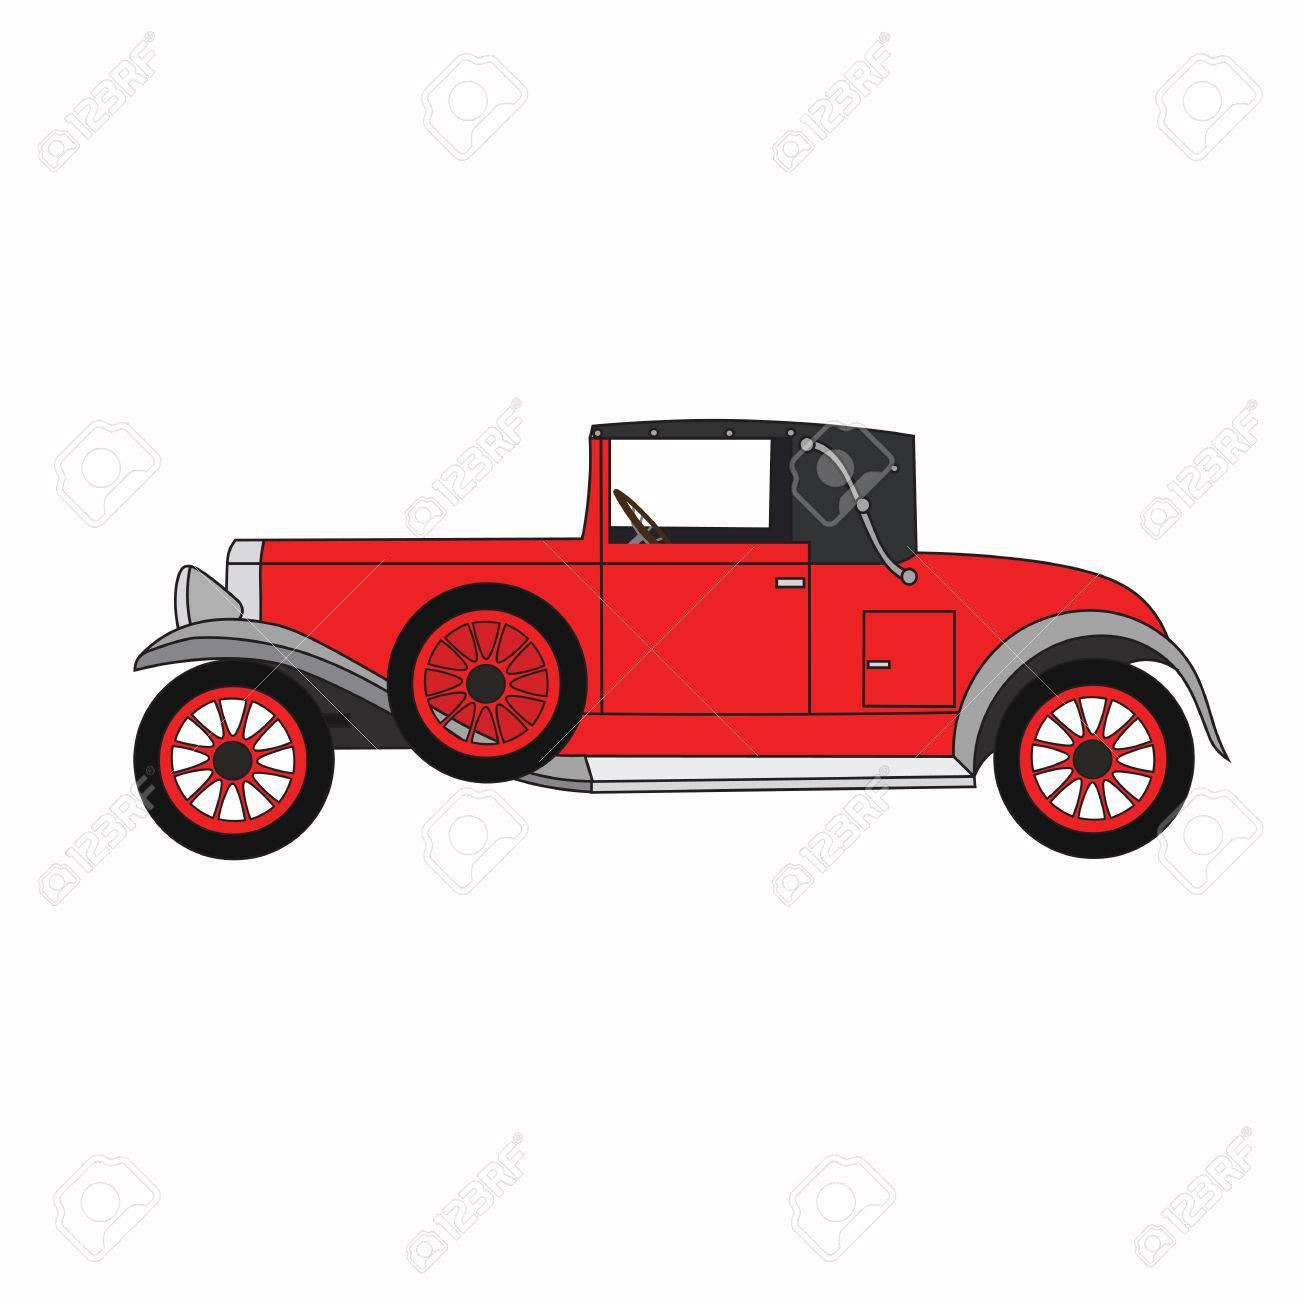 Red Cartoon Retro Car Vector Retro Convertible Royalty Free Cliparts Vectors And Stock Illustration Image 55110862